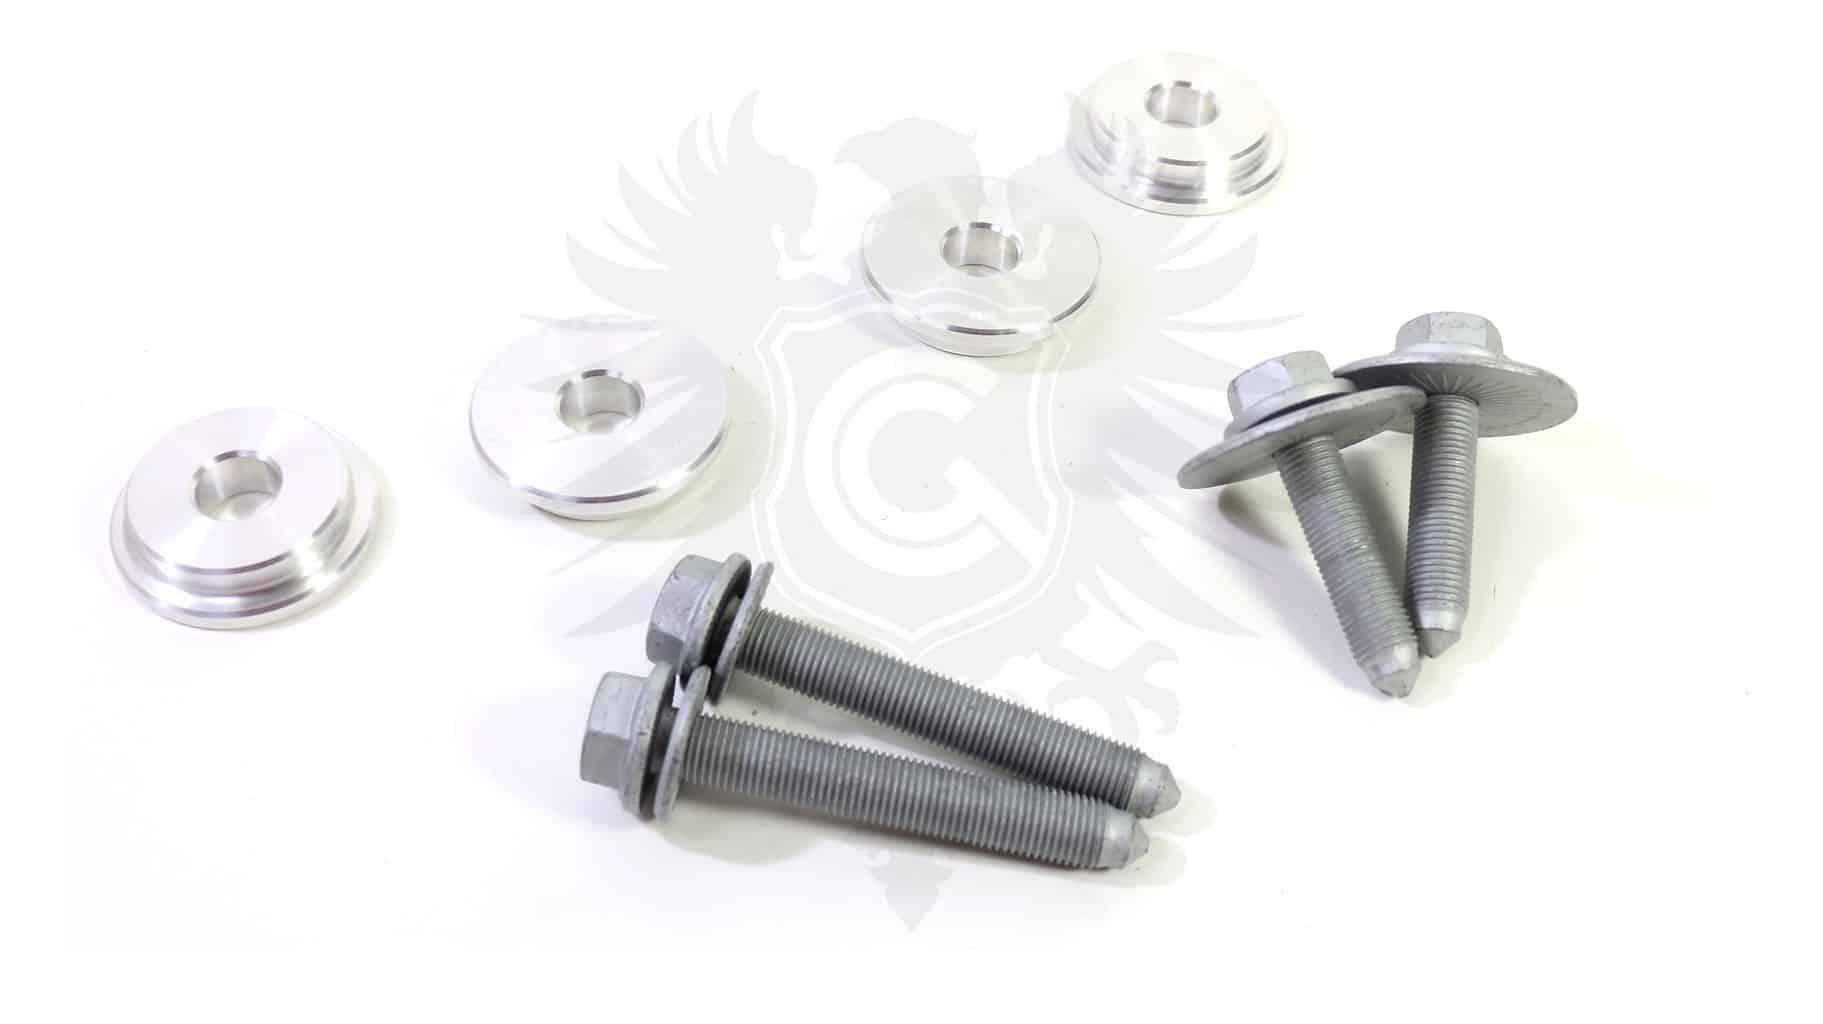 Subframe Bushing Kit, Mk4 Aluminum